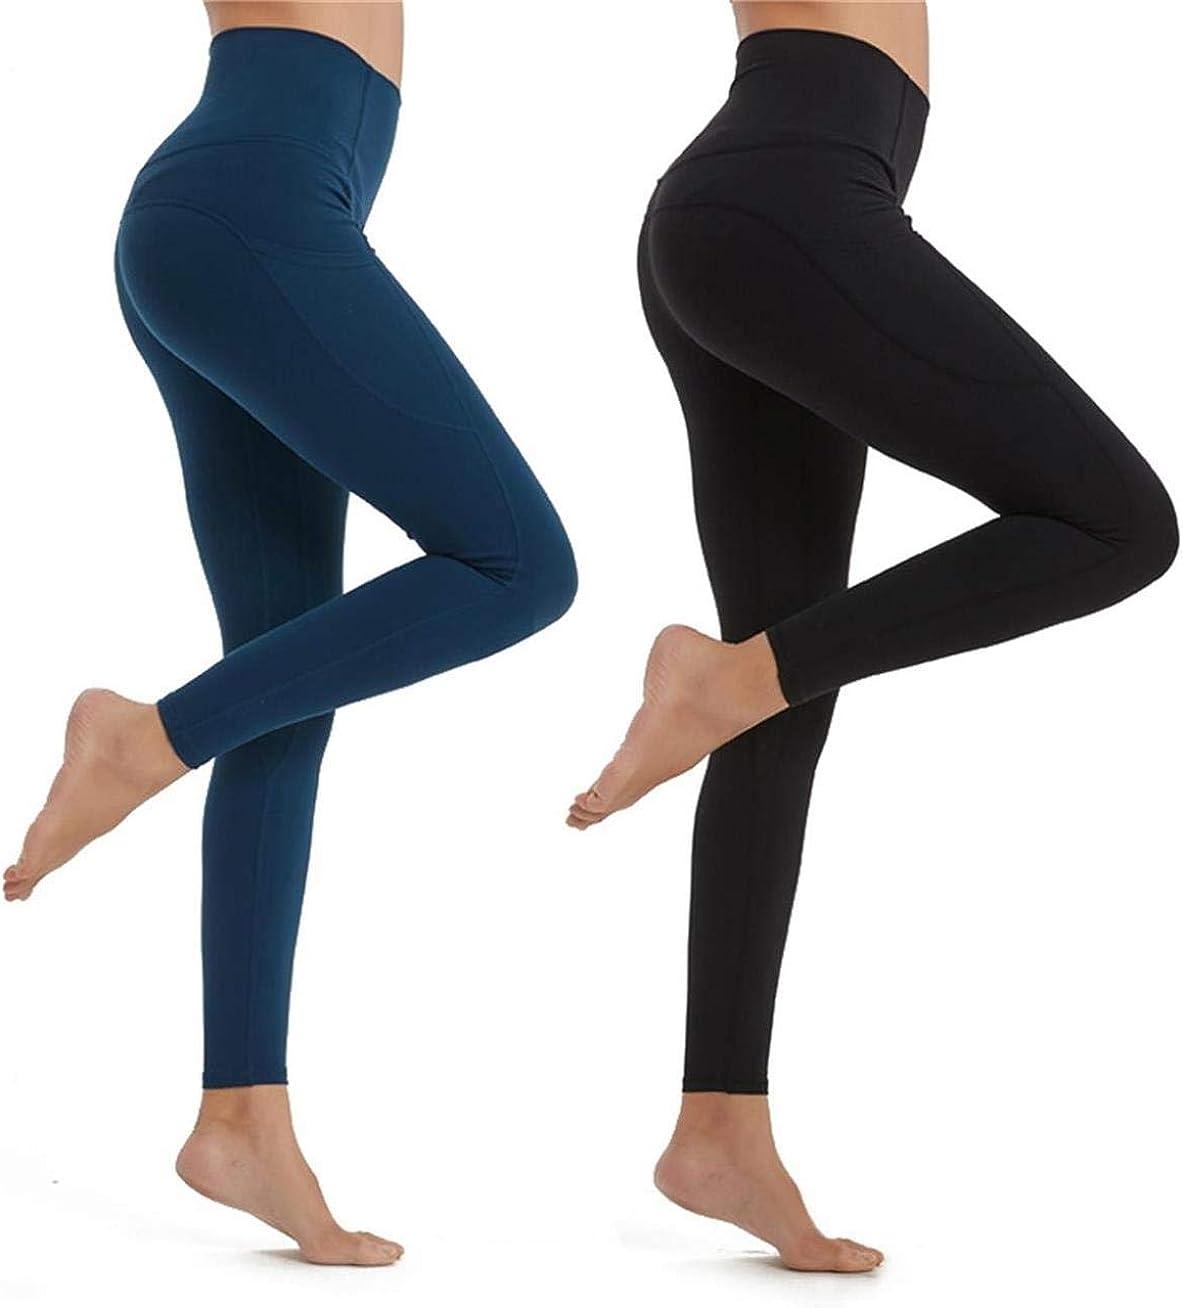 CMYRY Gym Super High Waist Yoga Pants, Pocket Yoga Pants, Tummy Control, Workout Running 4 Way Stretch Yoga Leggings